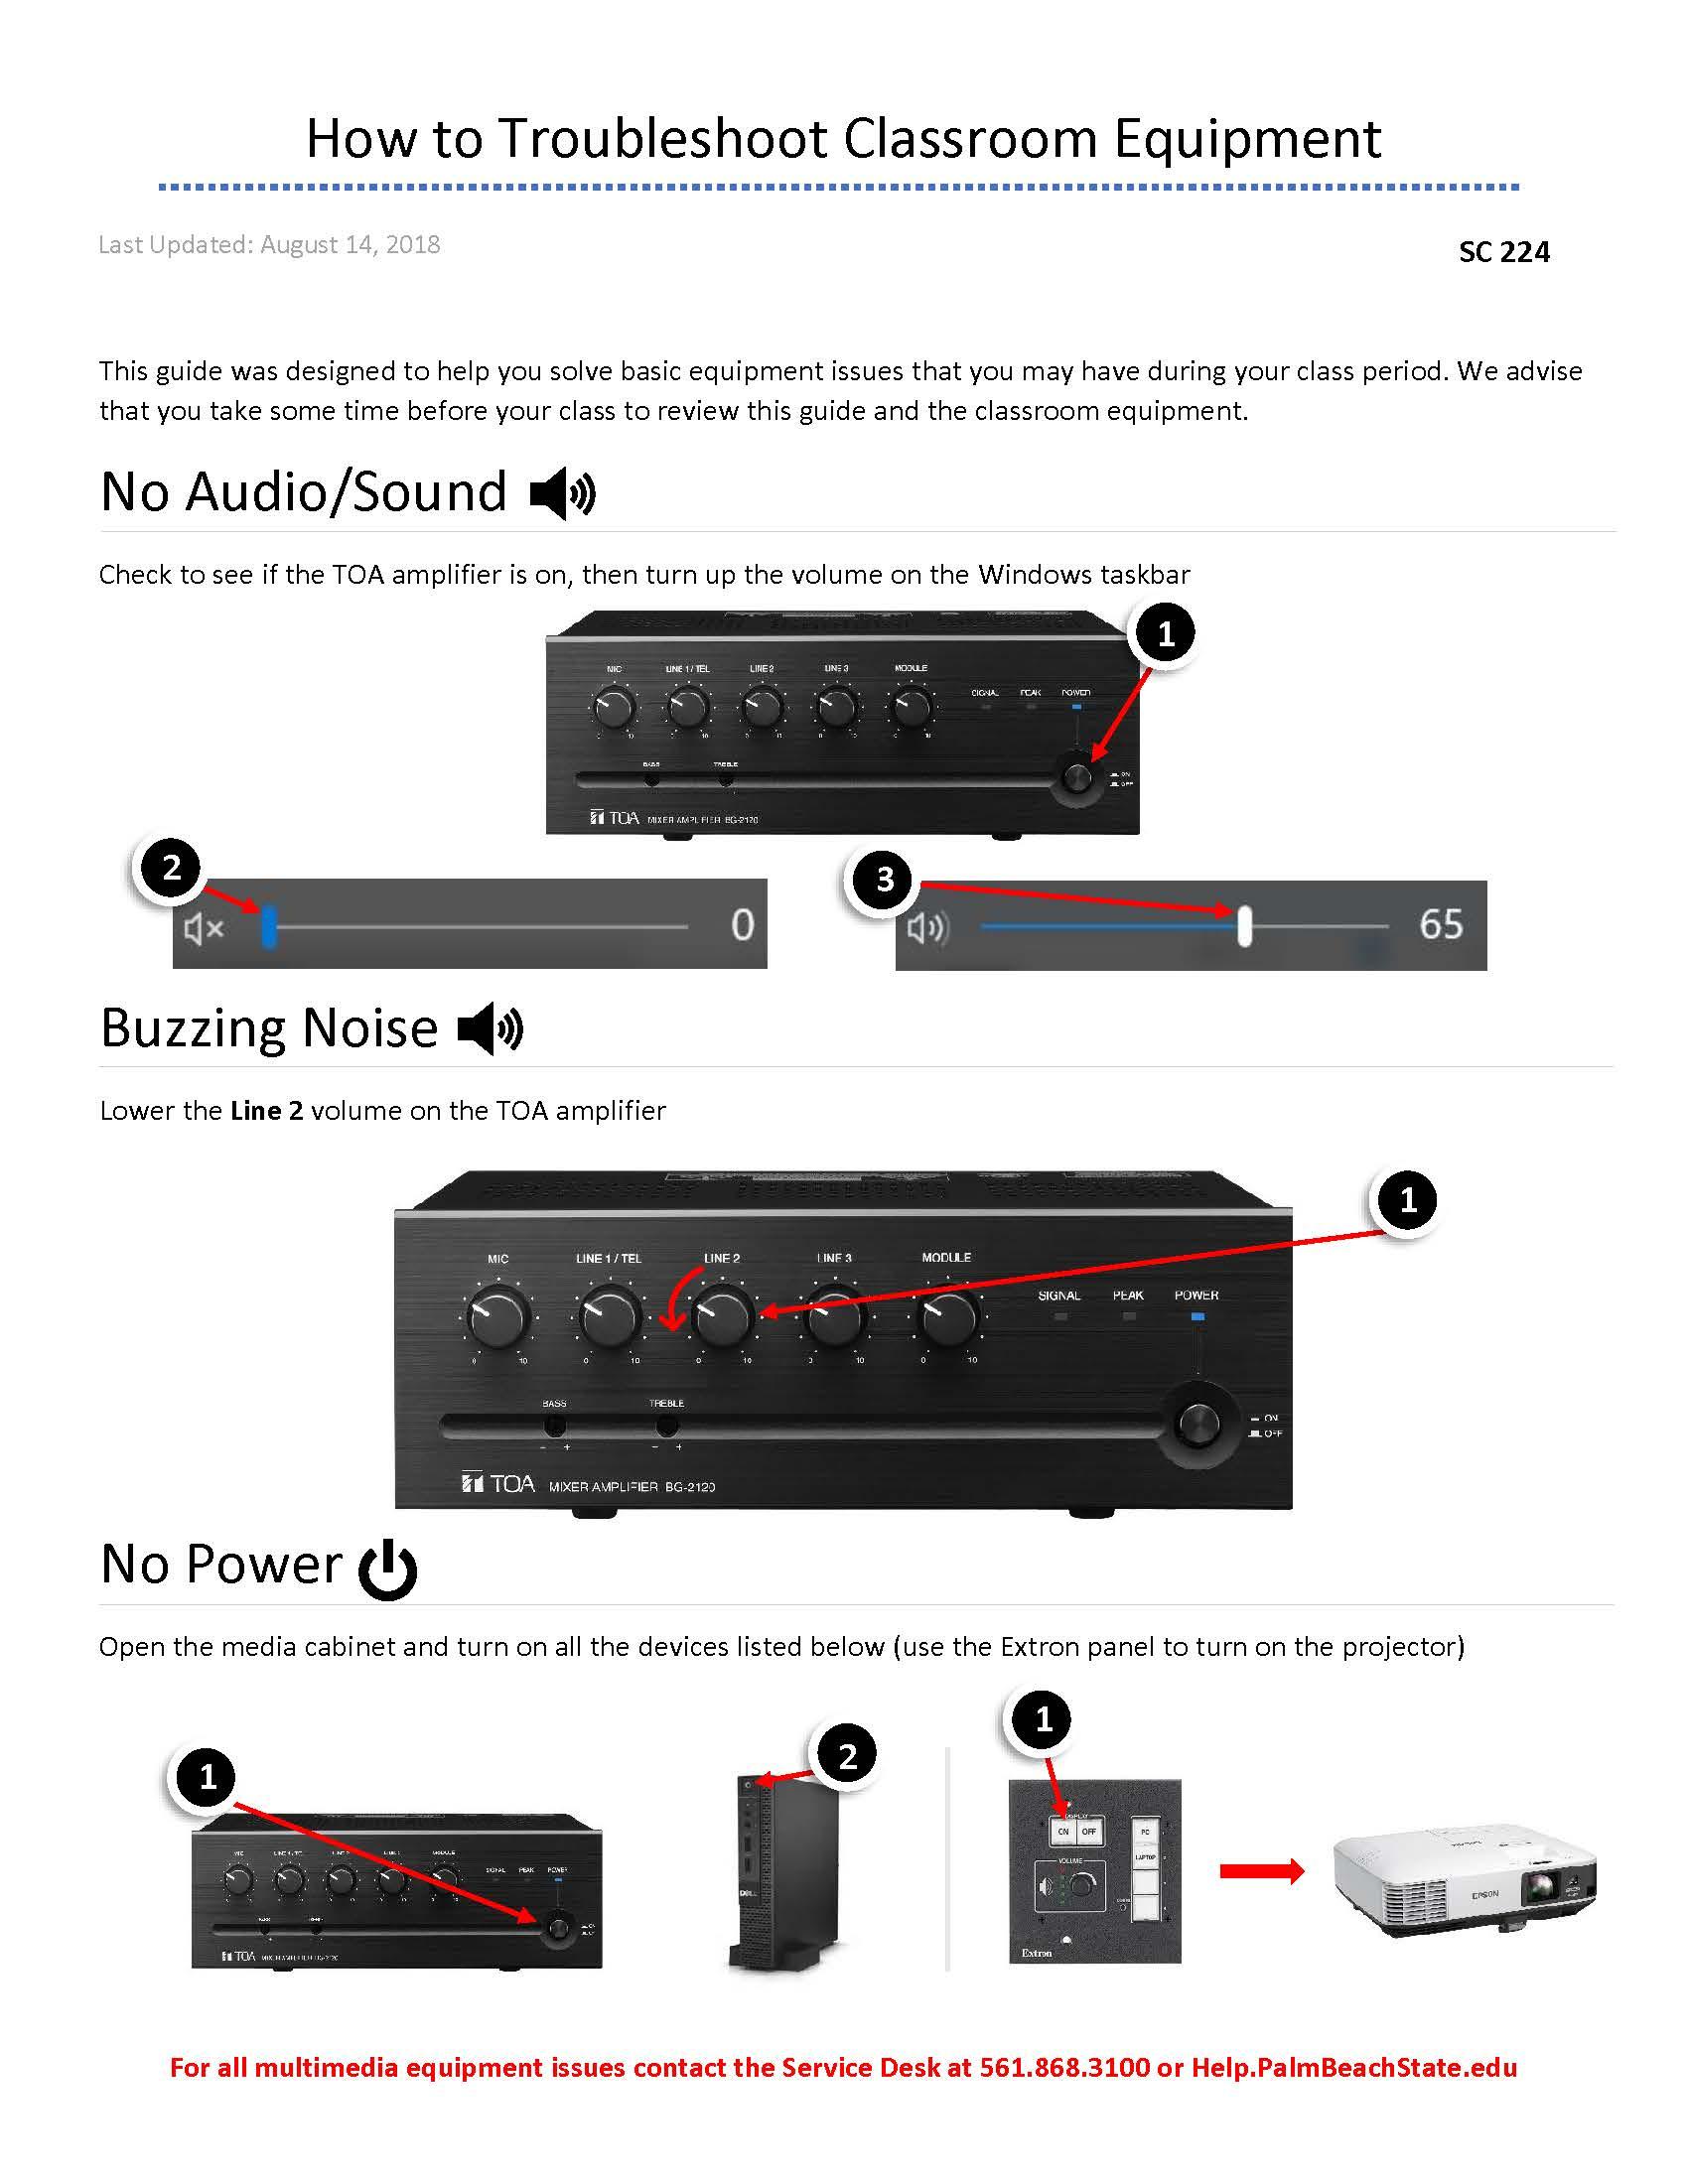 SC224 Multimedia Guide